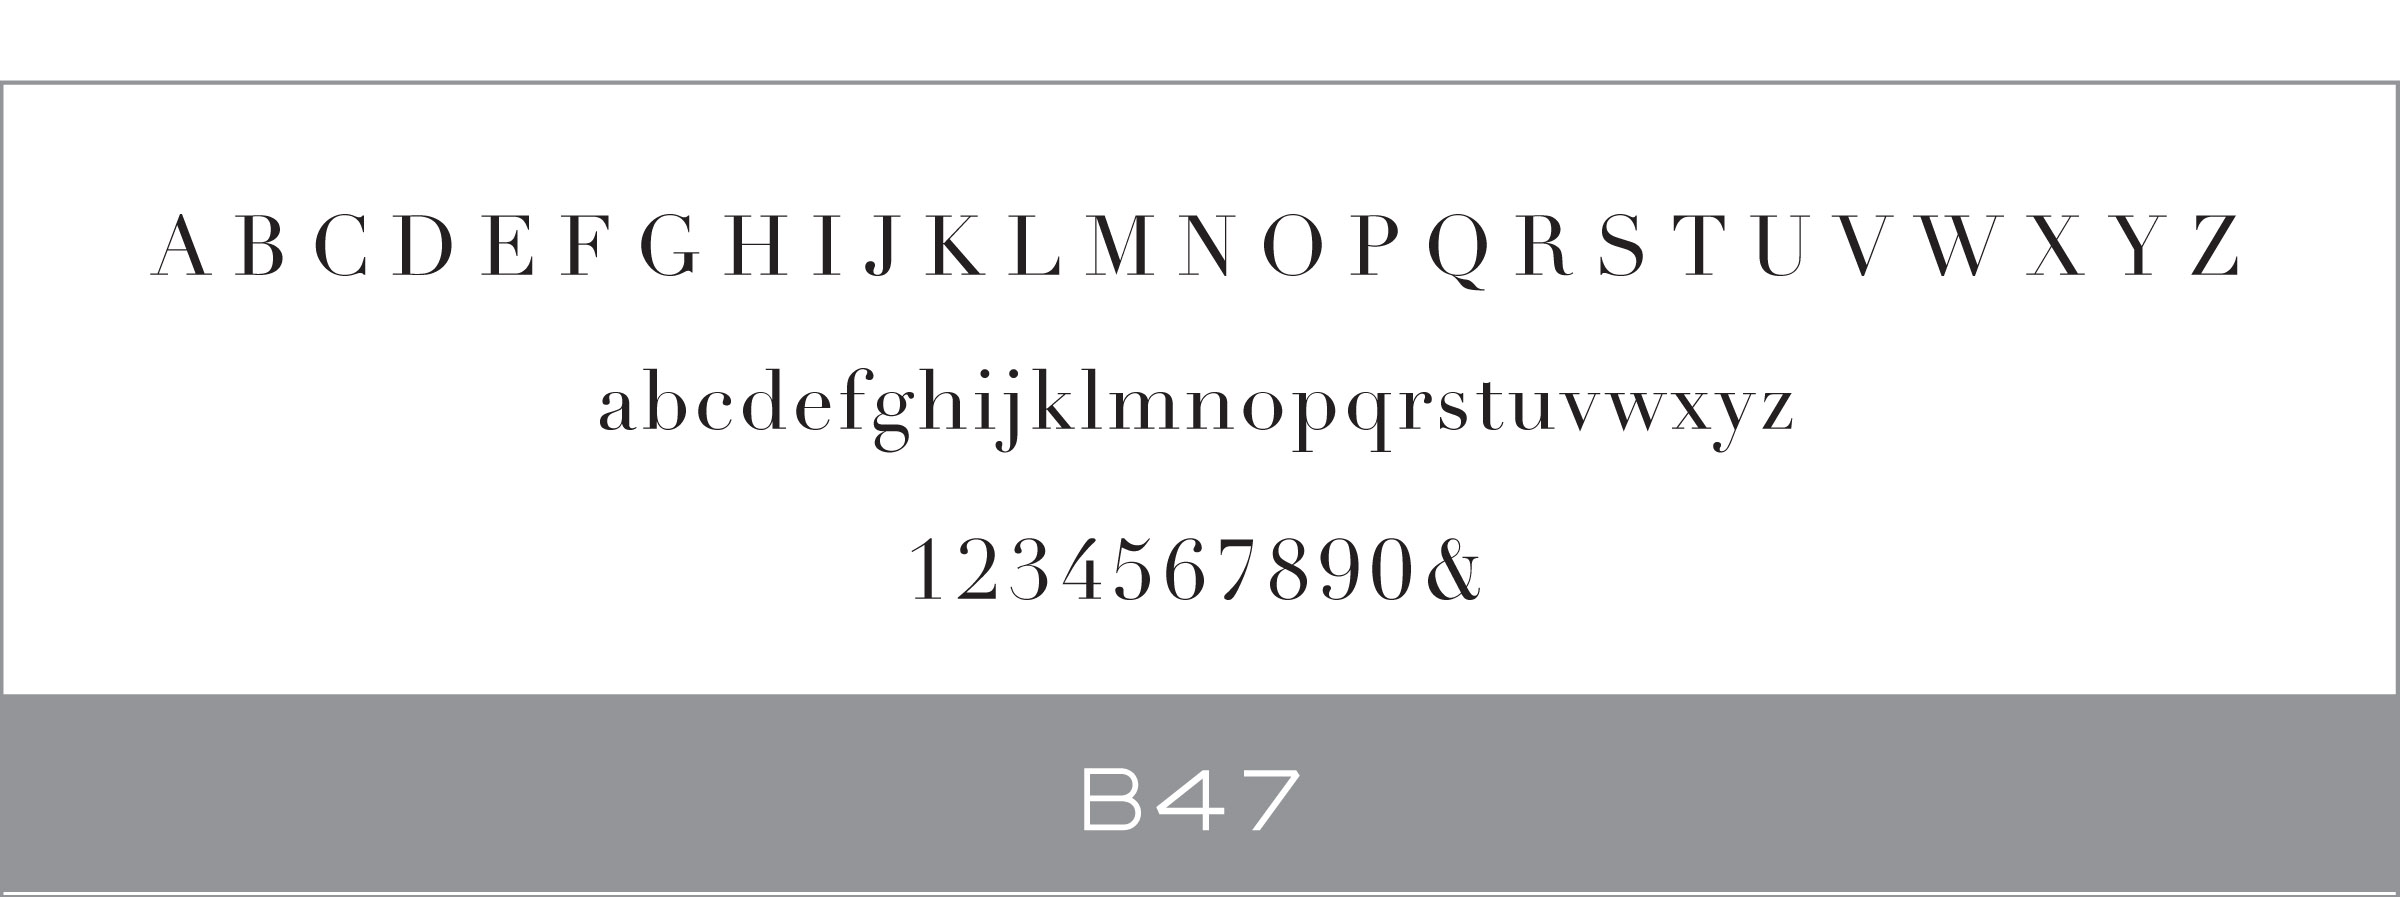 B47_Haute_Papier_Font.jpg